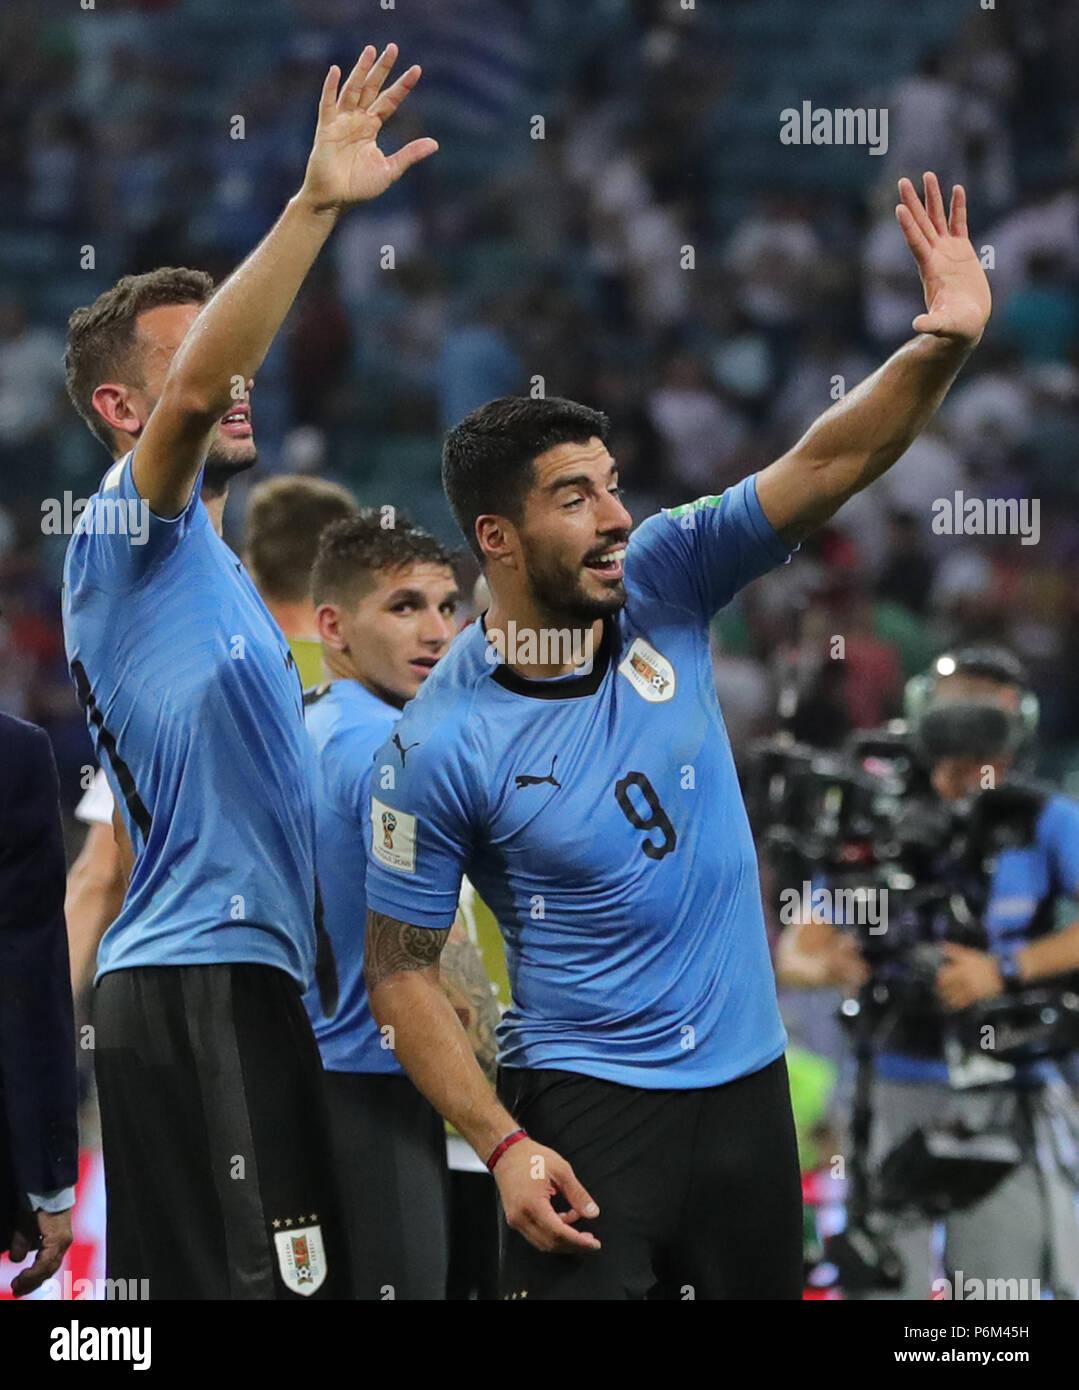 7331e11c0 Luis Suarez 2018 Stock Photos   Luis Suarez 2018 Stock Images - Alamy